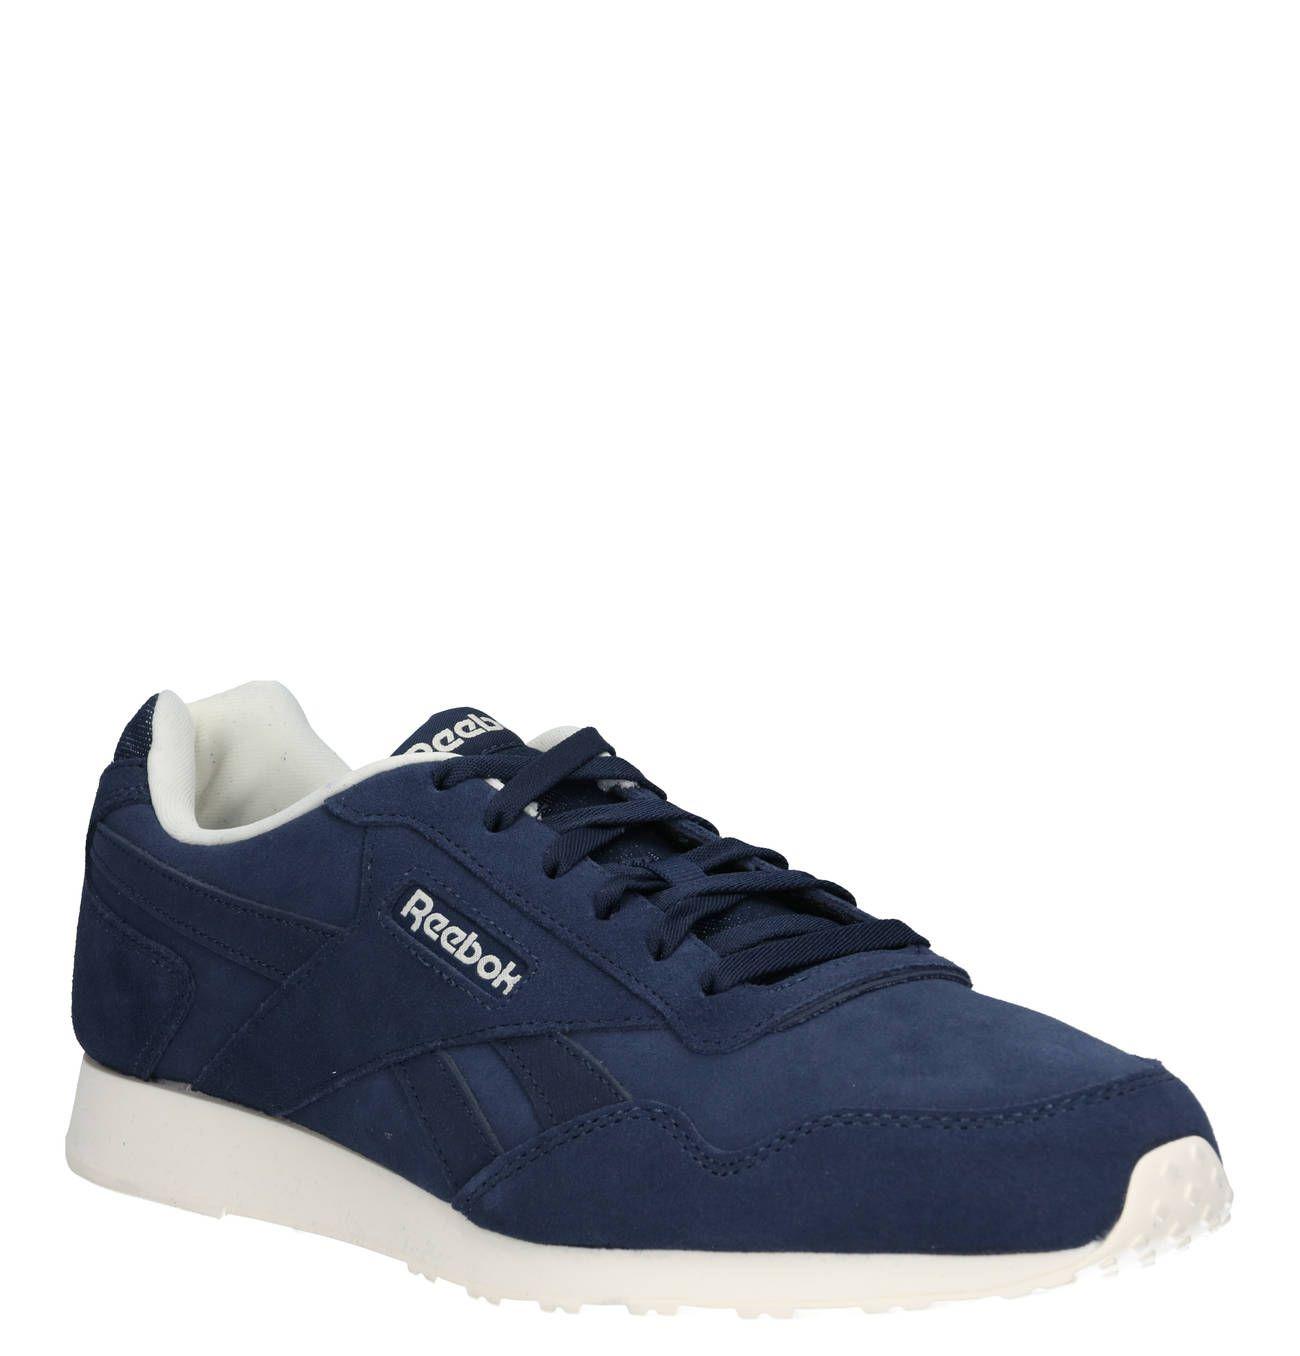 adidas Sneaker Duramo 9, Mesh, Kontrast Sohle, gedämpfte